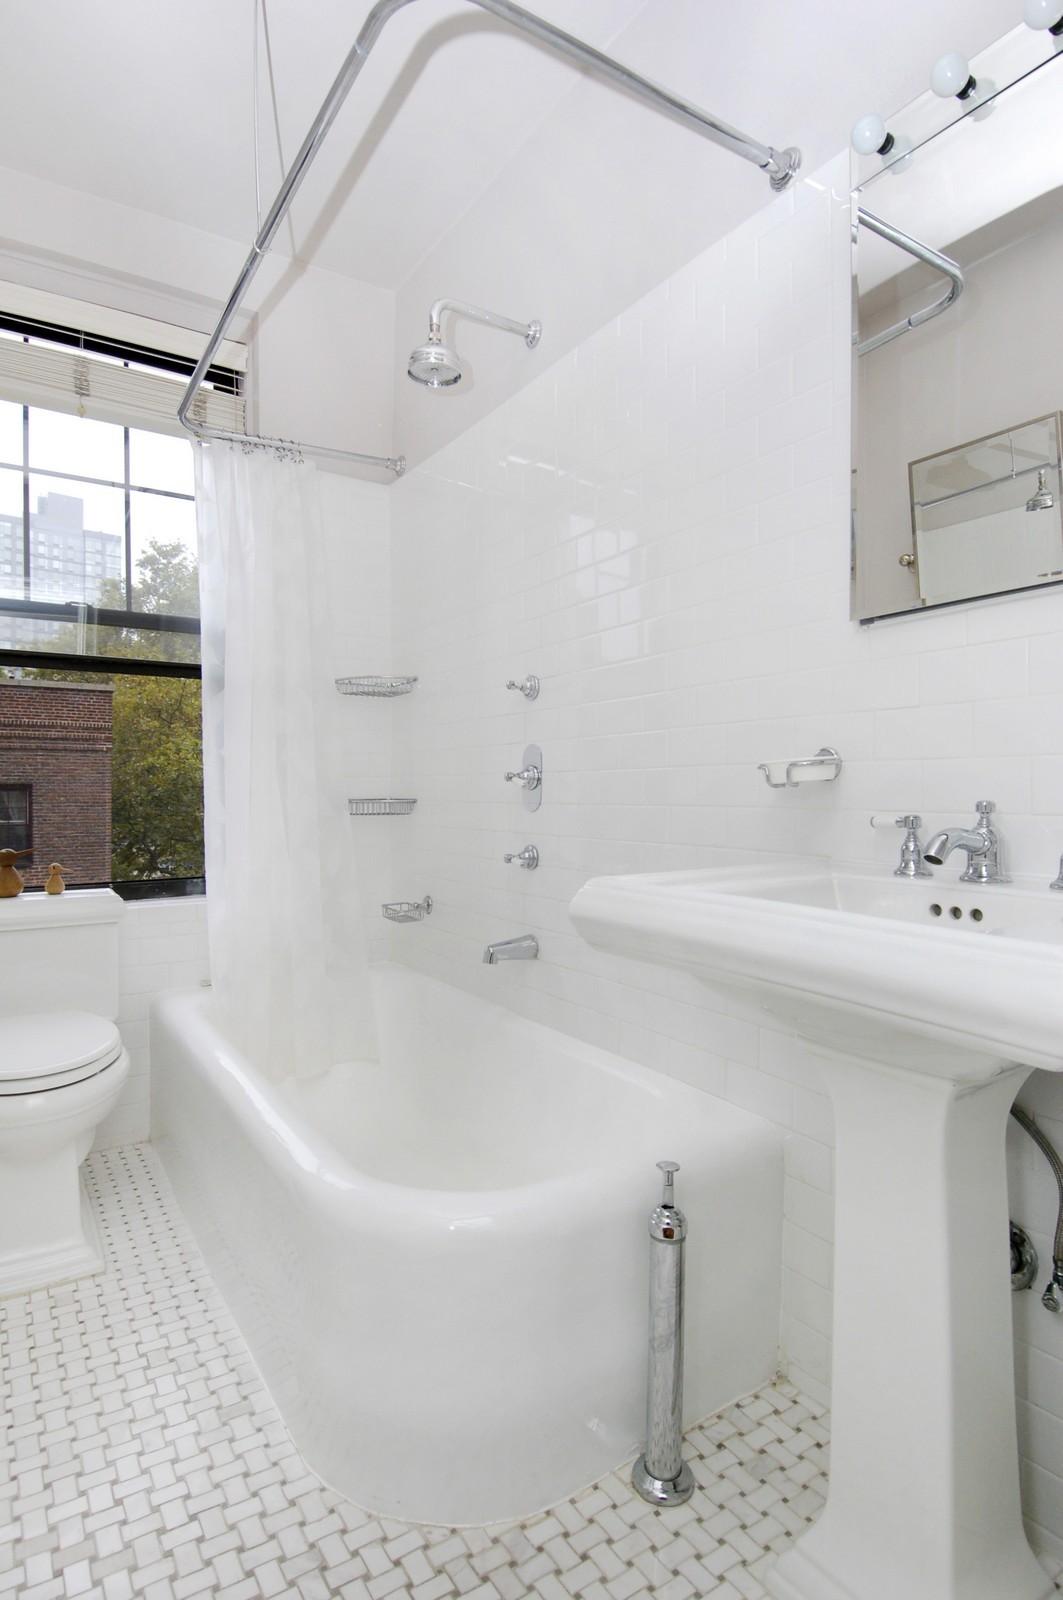 Real Estate Photography - 141 E 3, Apt 4G, New York, NY, 10009 - Bathroom